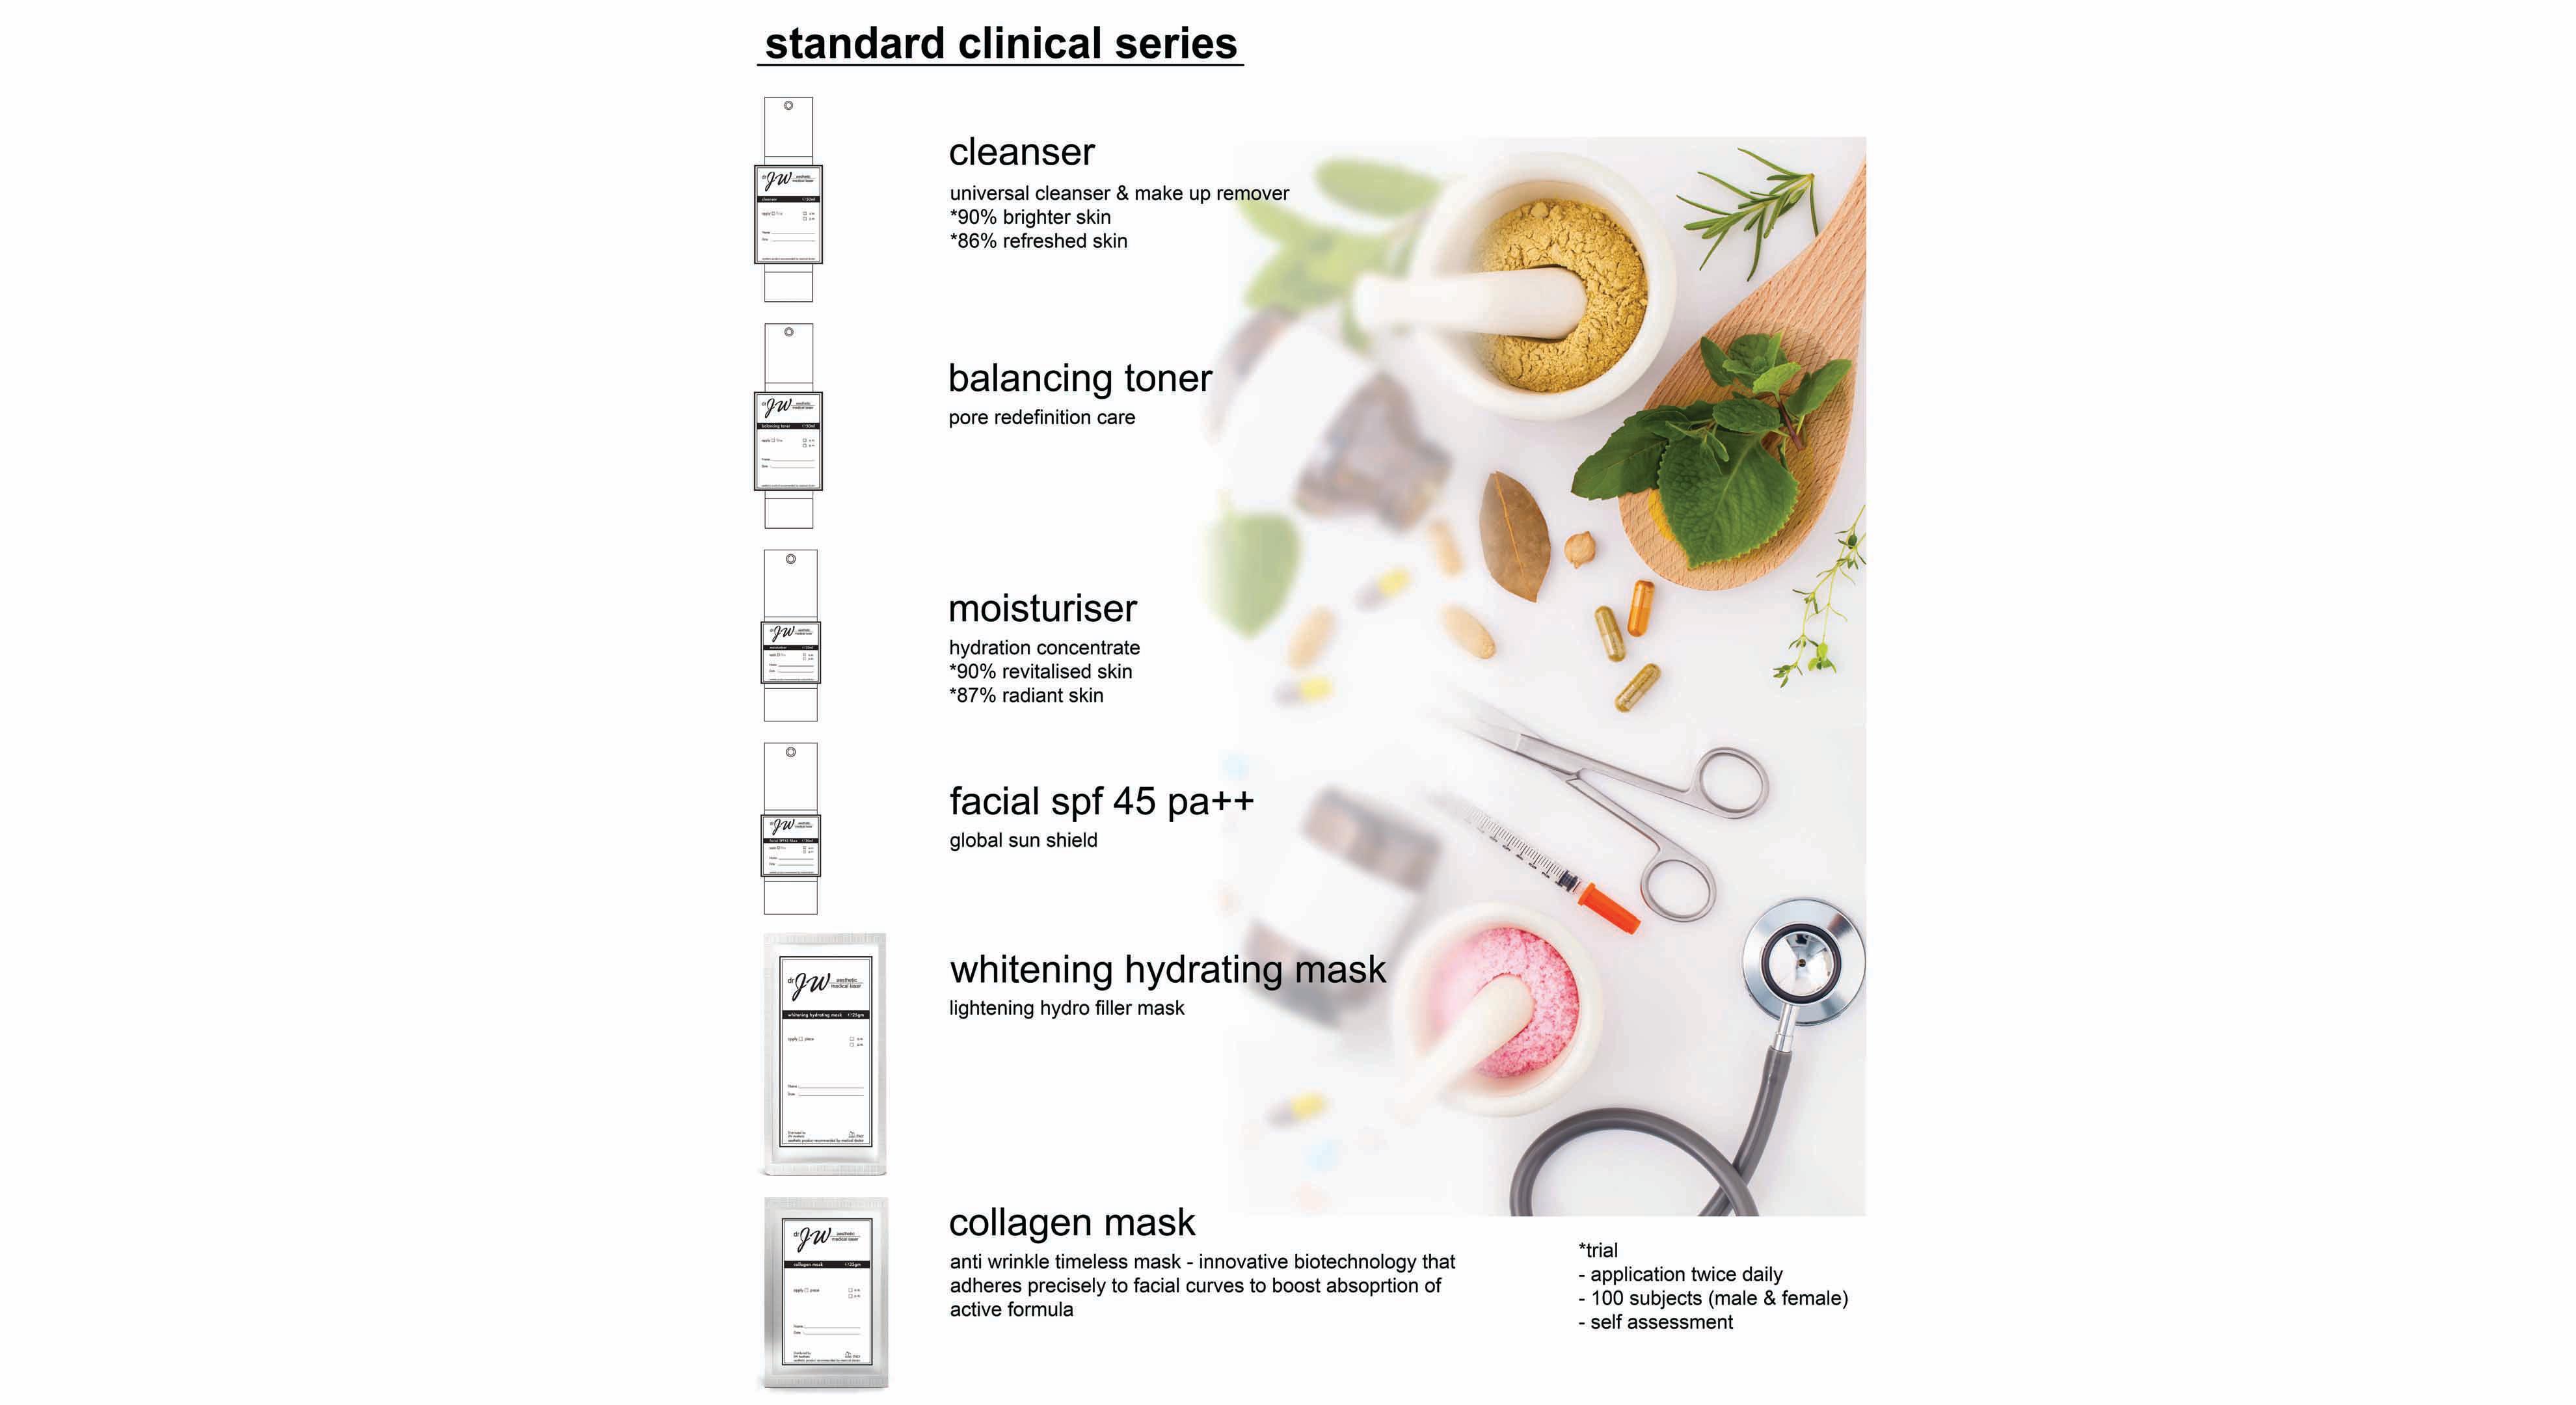 standard clinical series